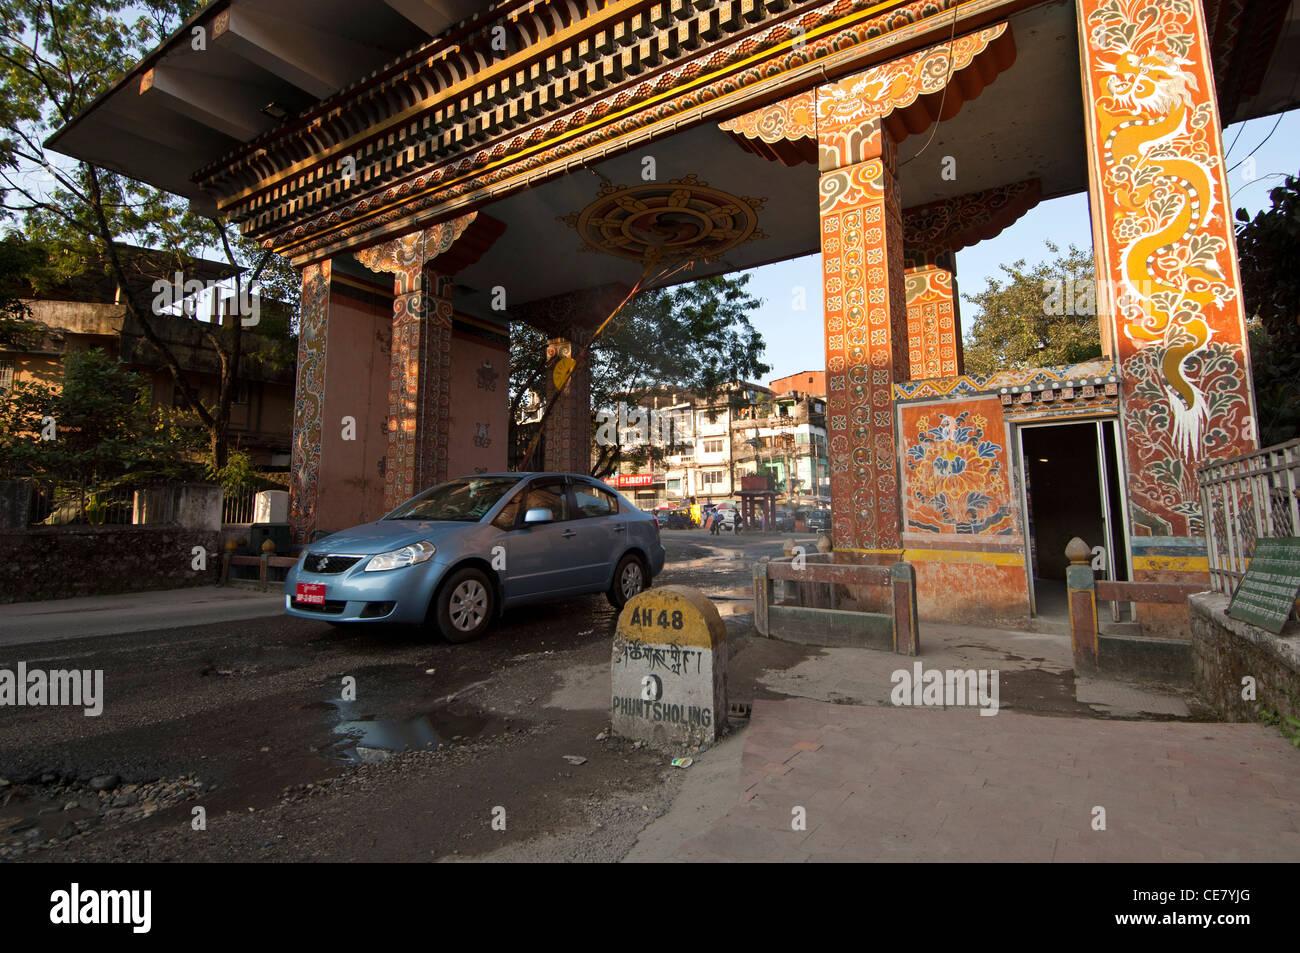 Vehicle crossing the border between India and Bhutan through the Gate of Bhutan, Phuentsholing, Bhutan - Stock Image